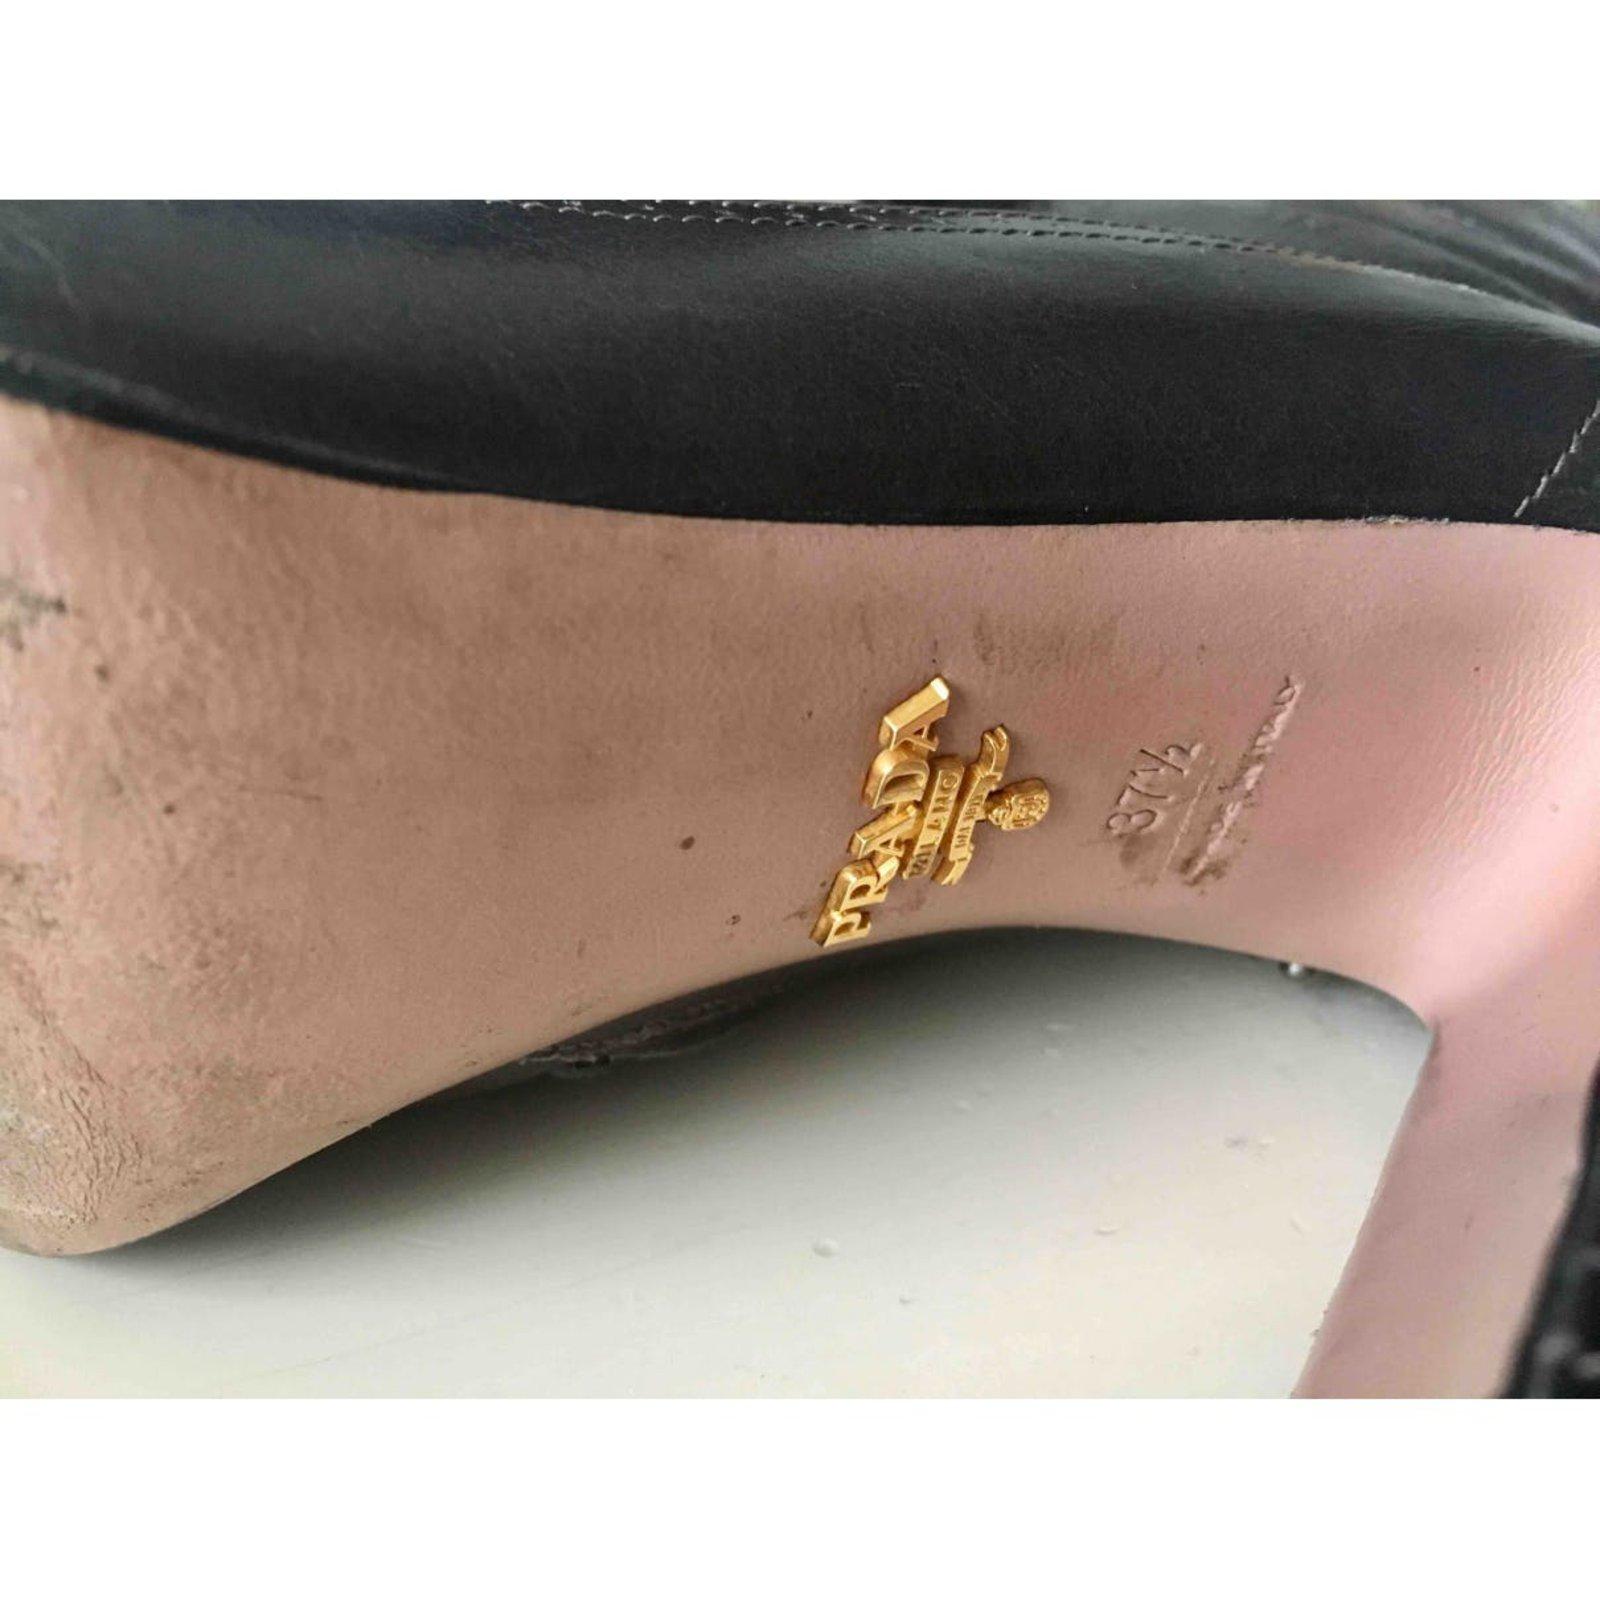 1dfcbc5f92 Prada High heels boots Ankle Boots Leather Khaki ref.88138 - Joli Closet